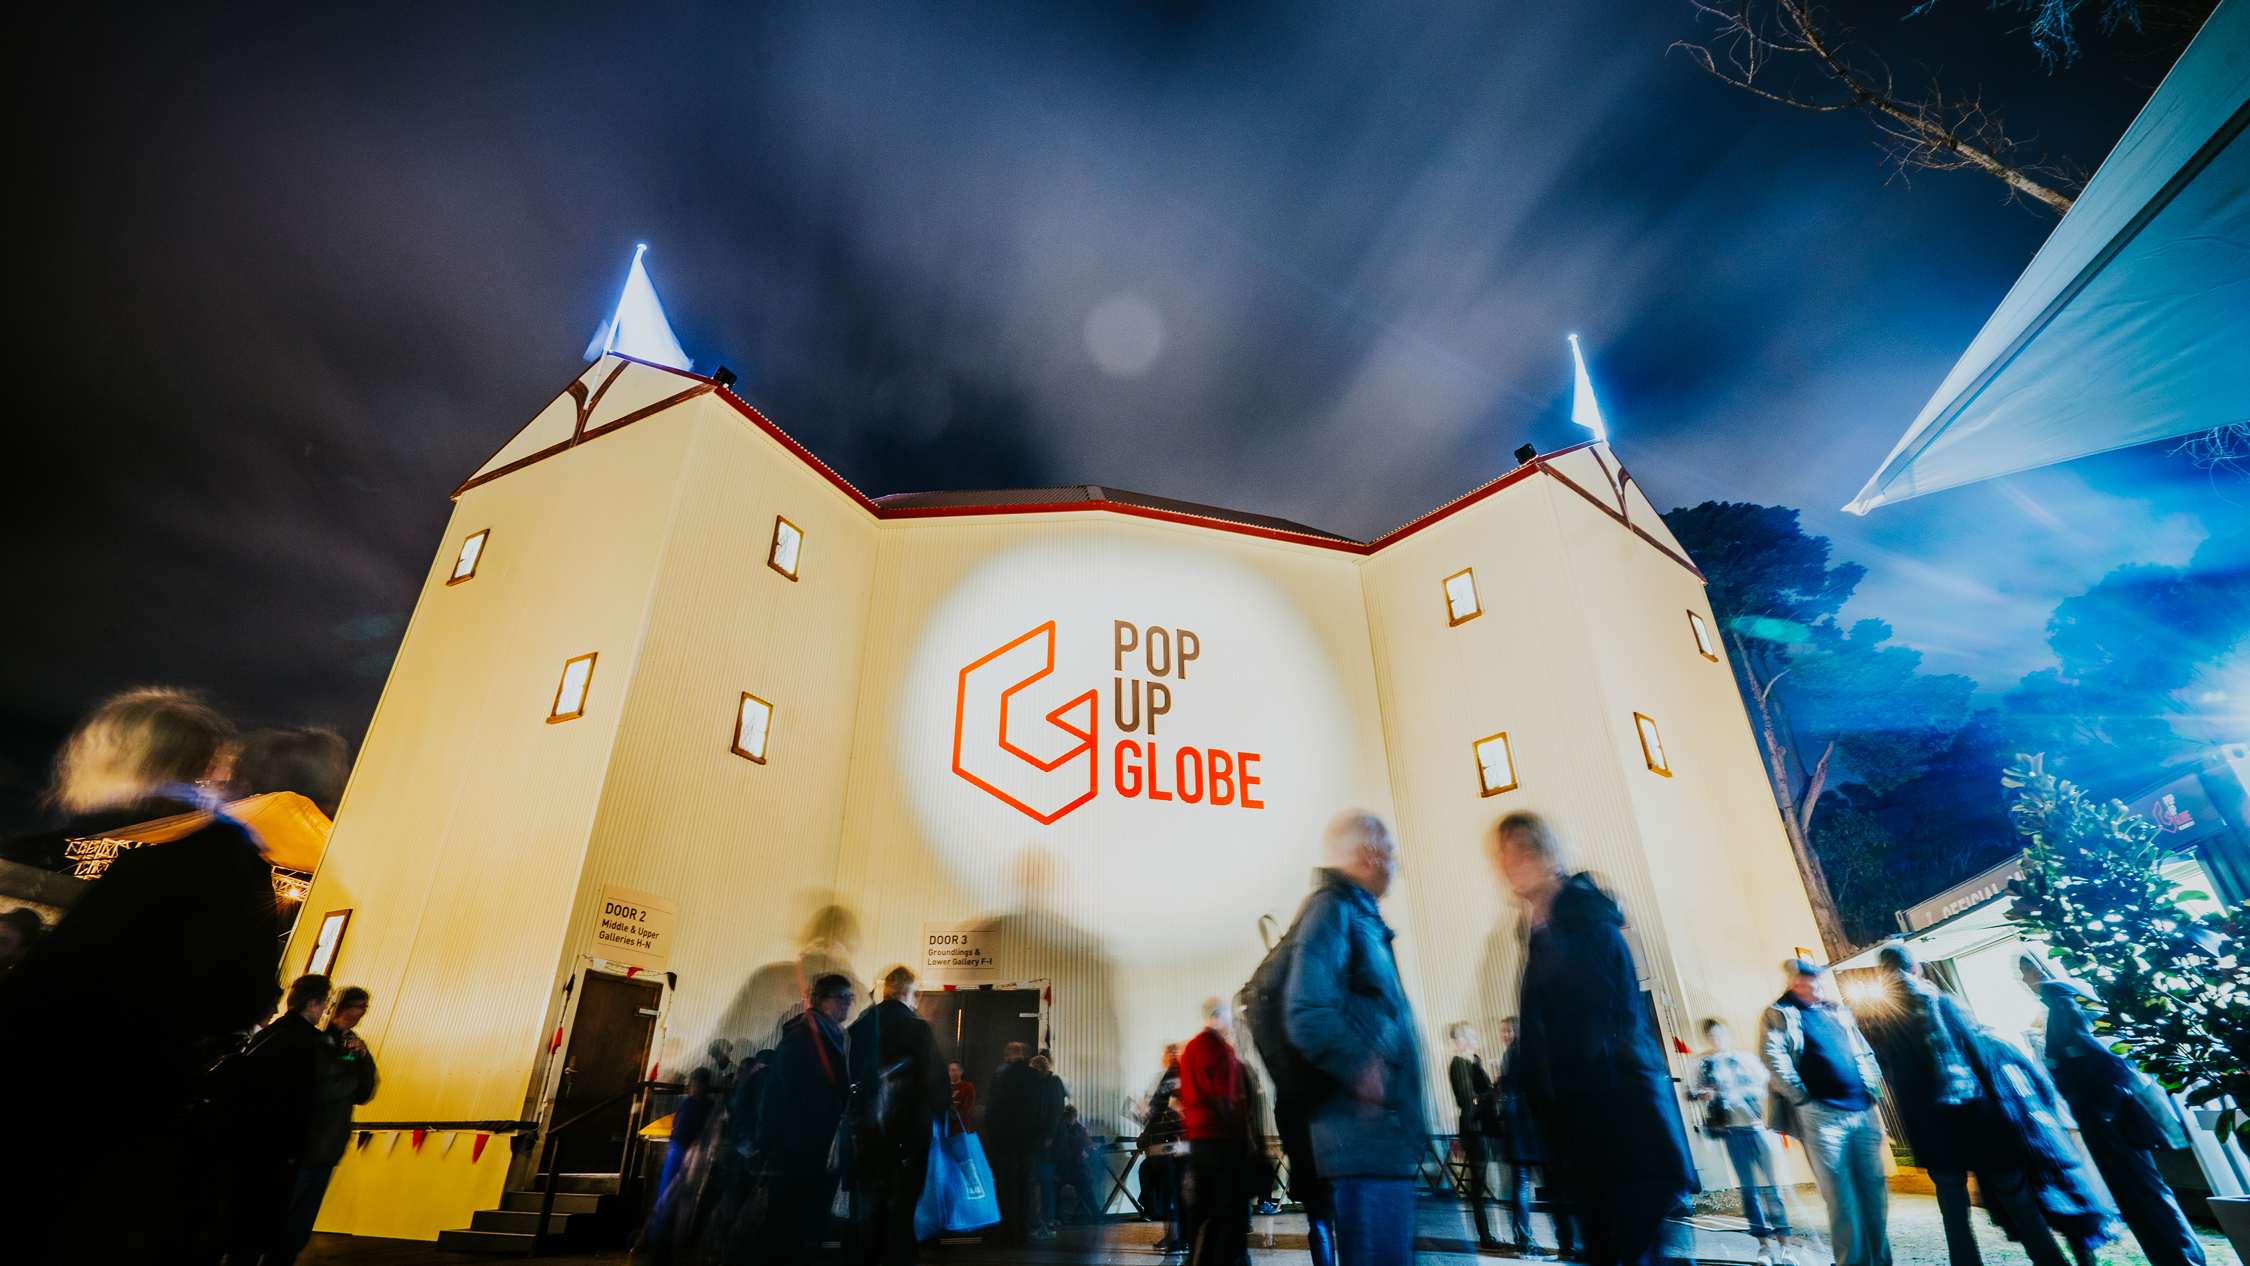 Pop-Up Globe 2018 photo supplied